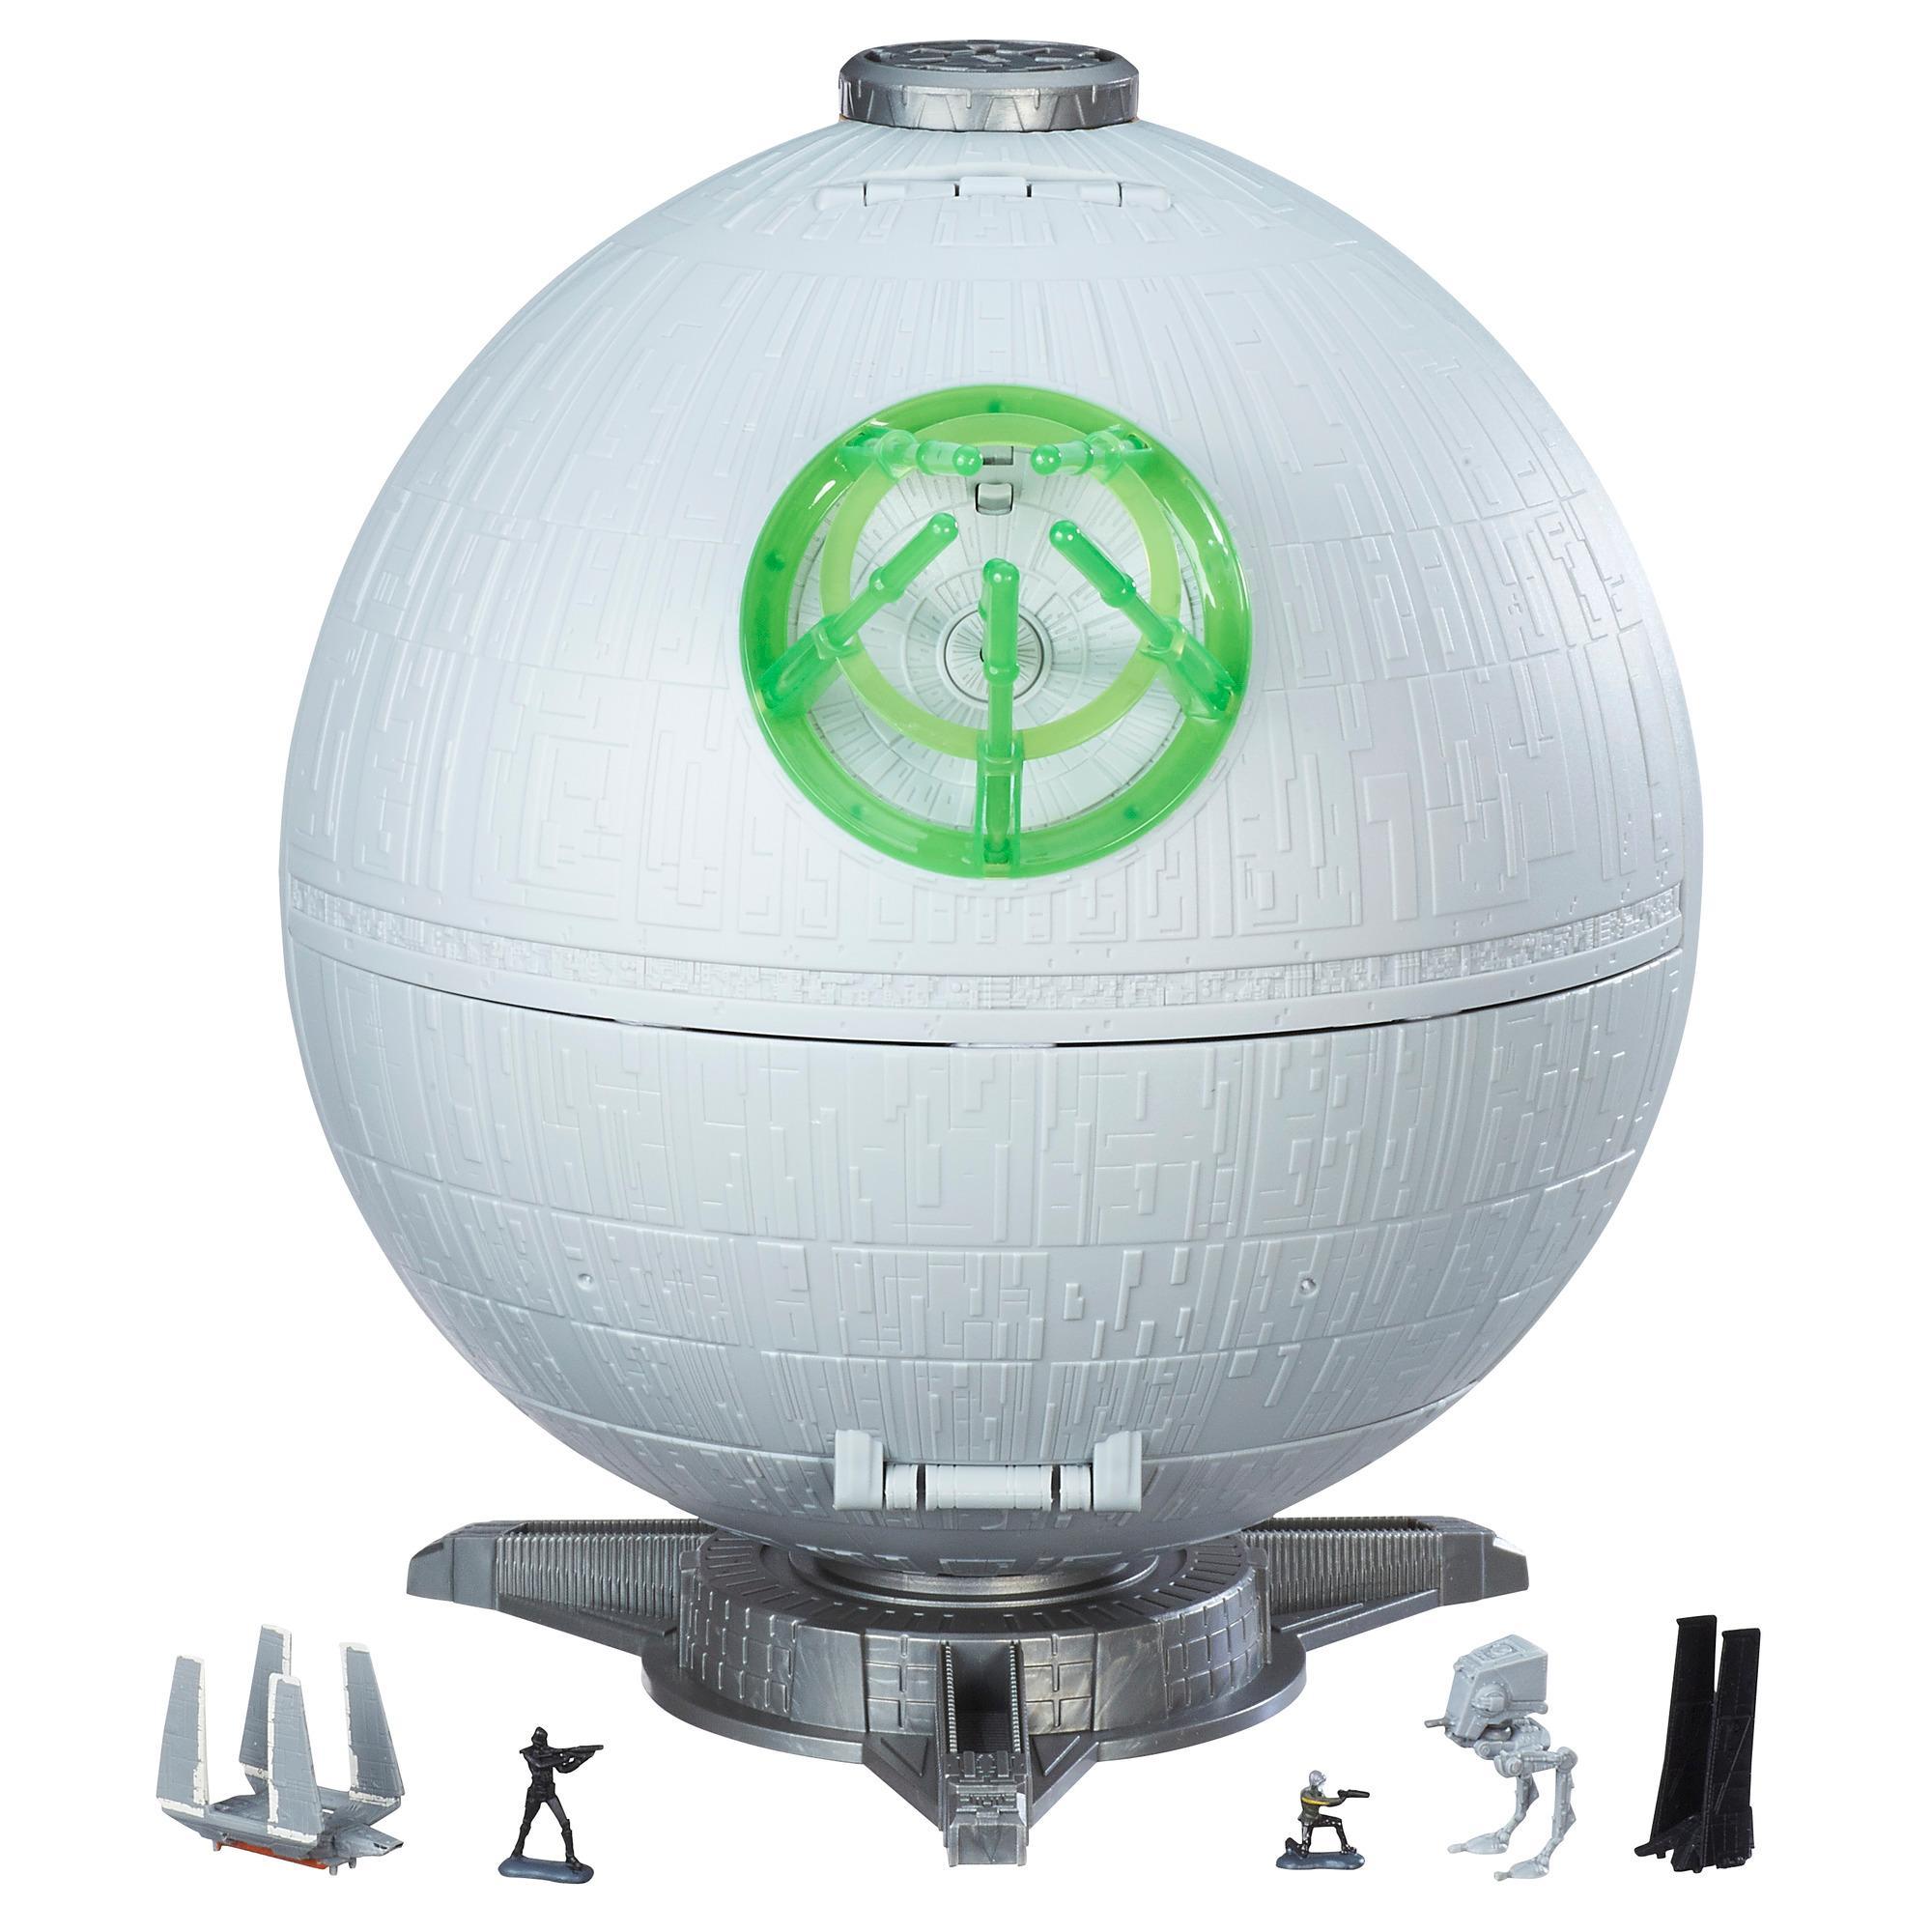 Star Wars: Rogue One Micro Machines Death Star Playset